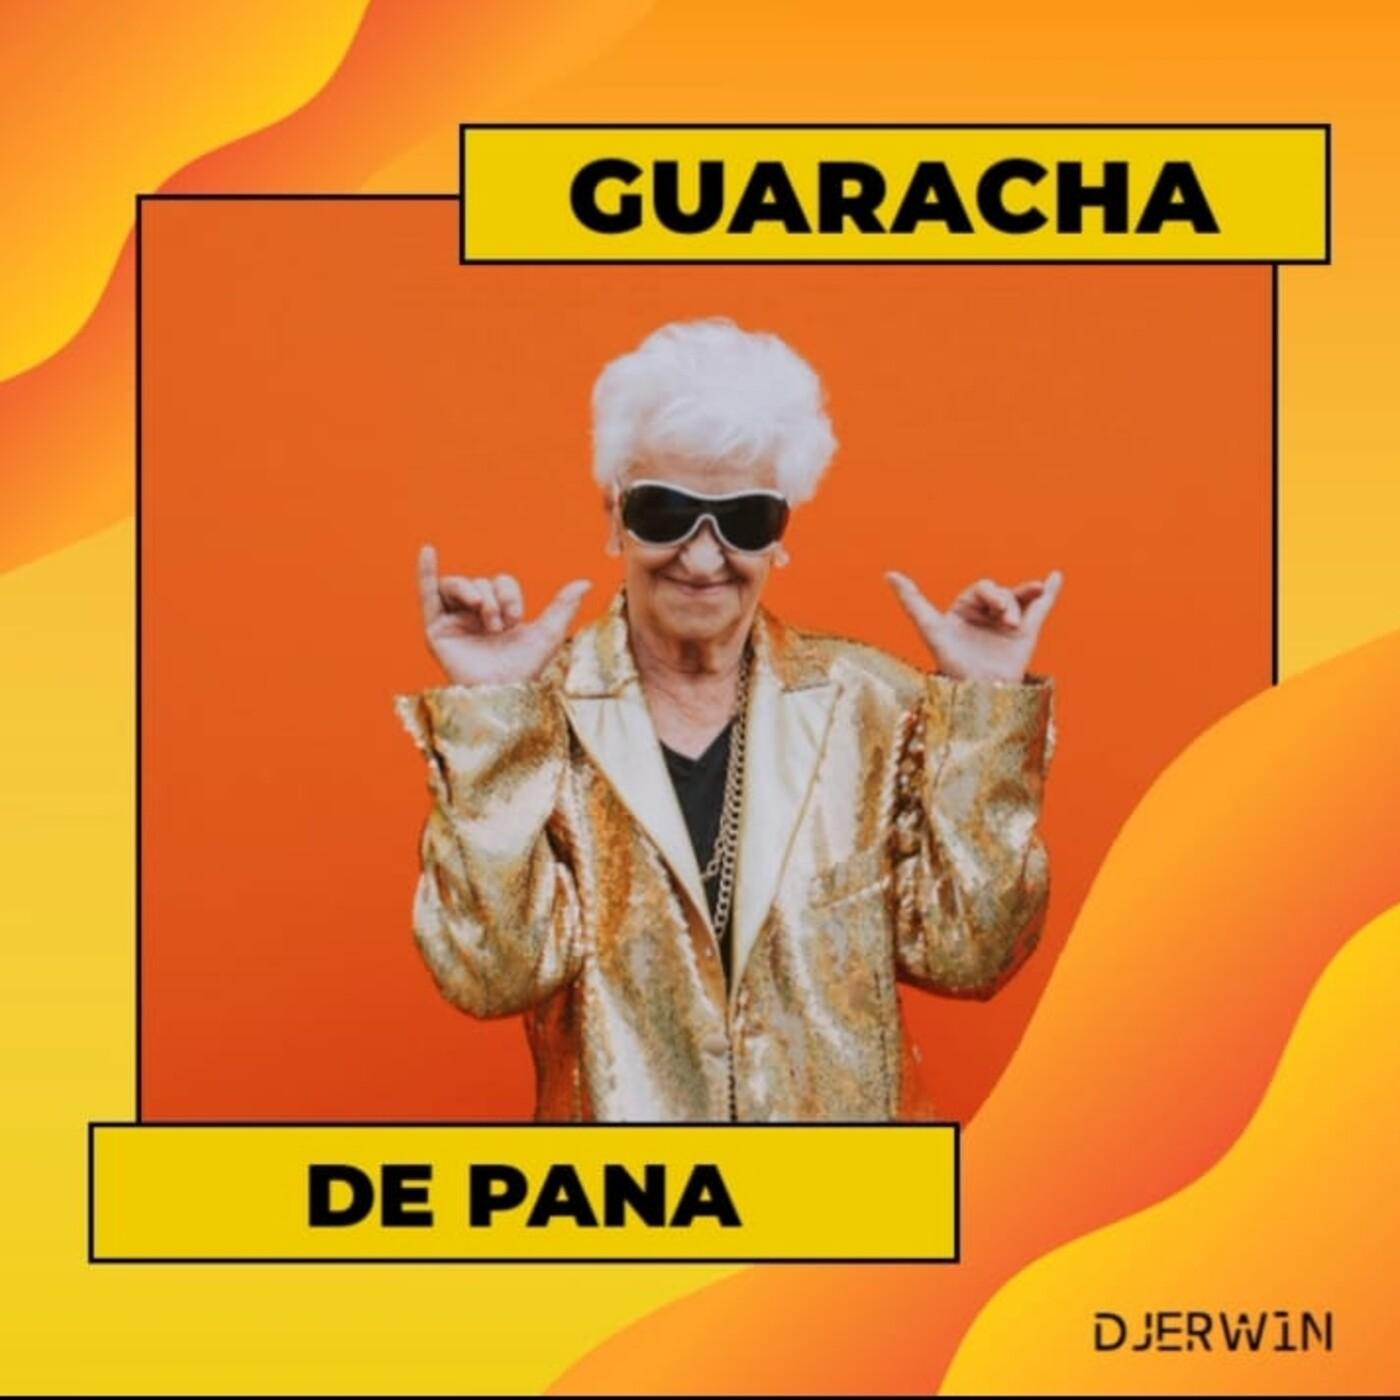 Guaracheo 2020